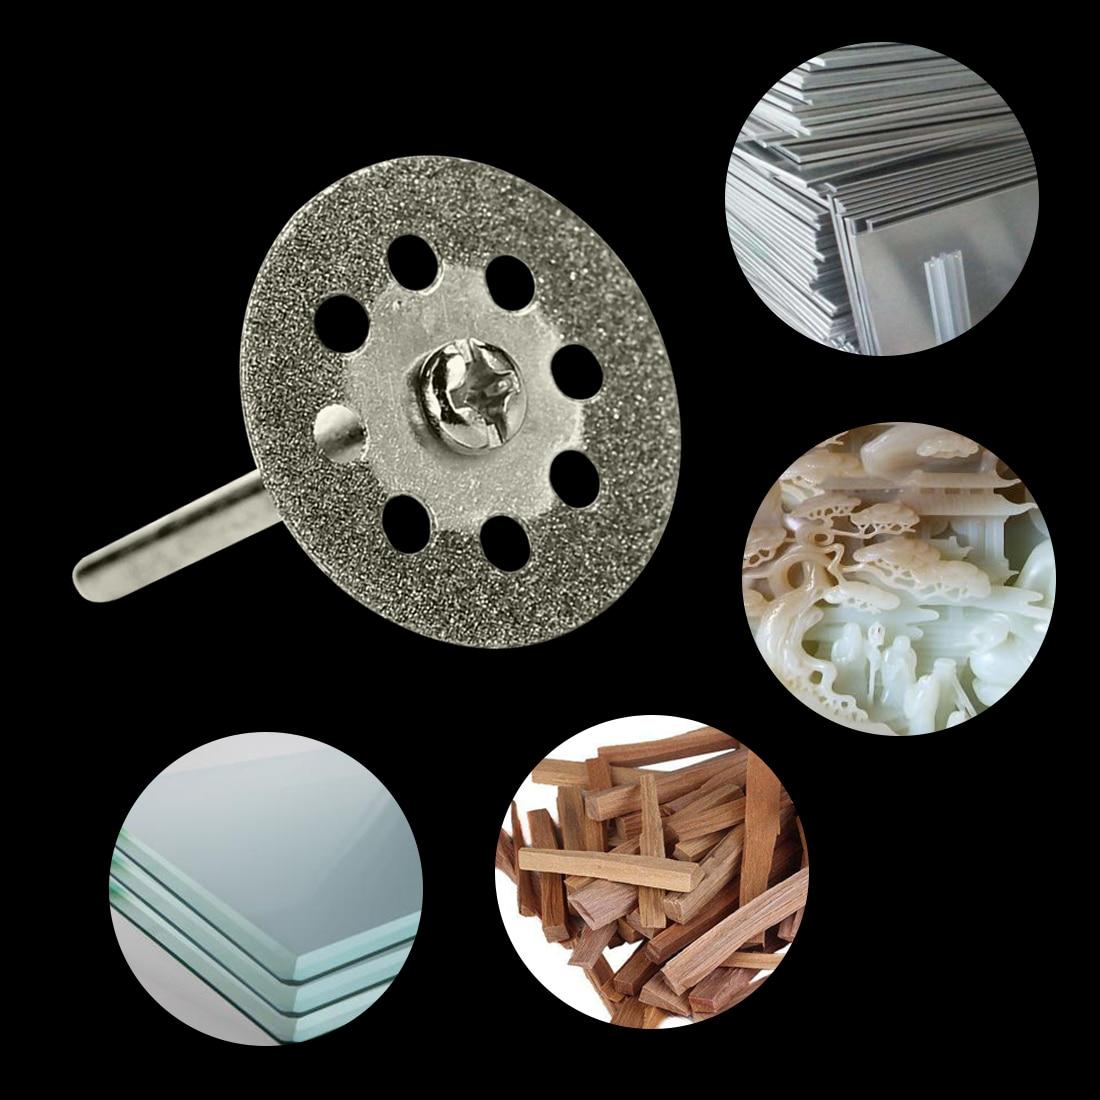 Diamond Grinding Wheel Saw Circular Cutting Disc Dremel Rotary Tool  5pcs 22mm Diamond Discs Dremel Accessories